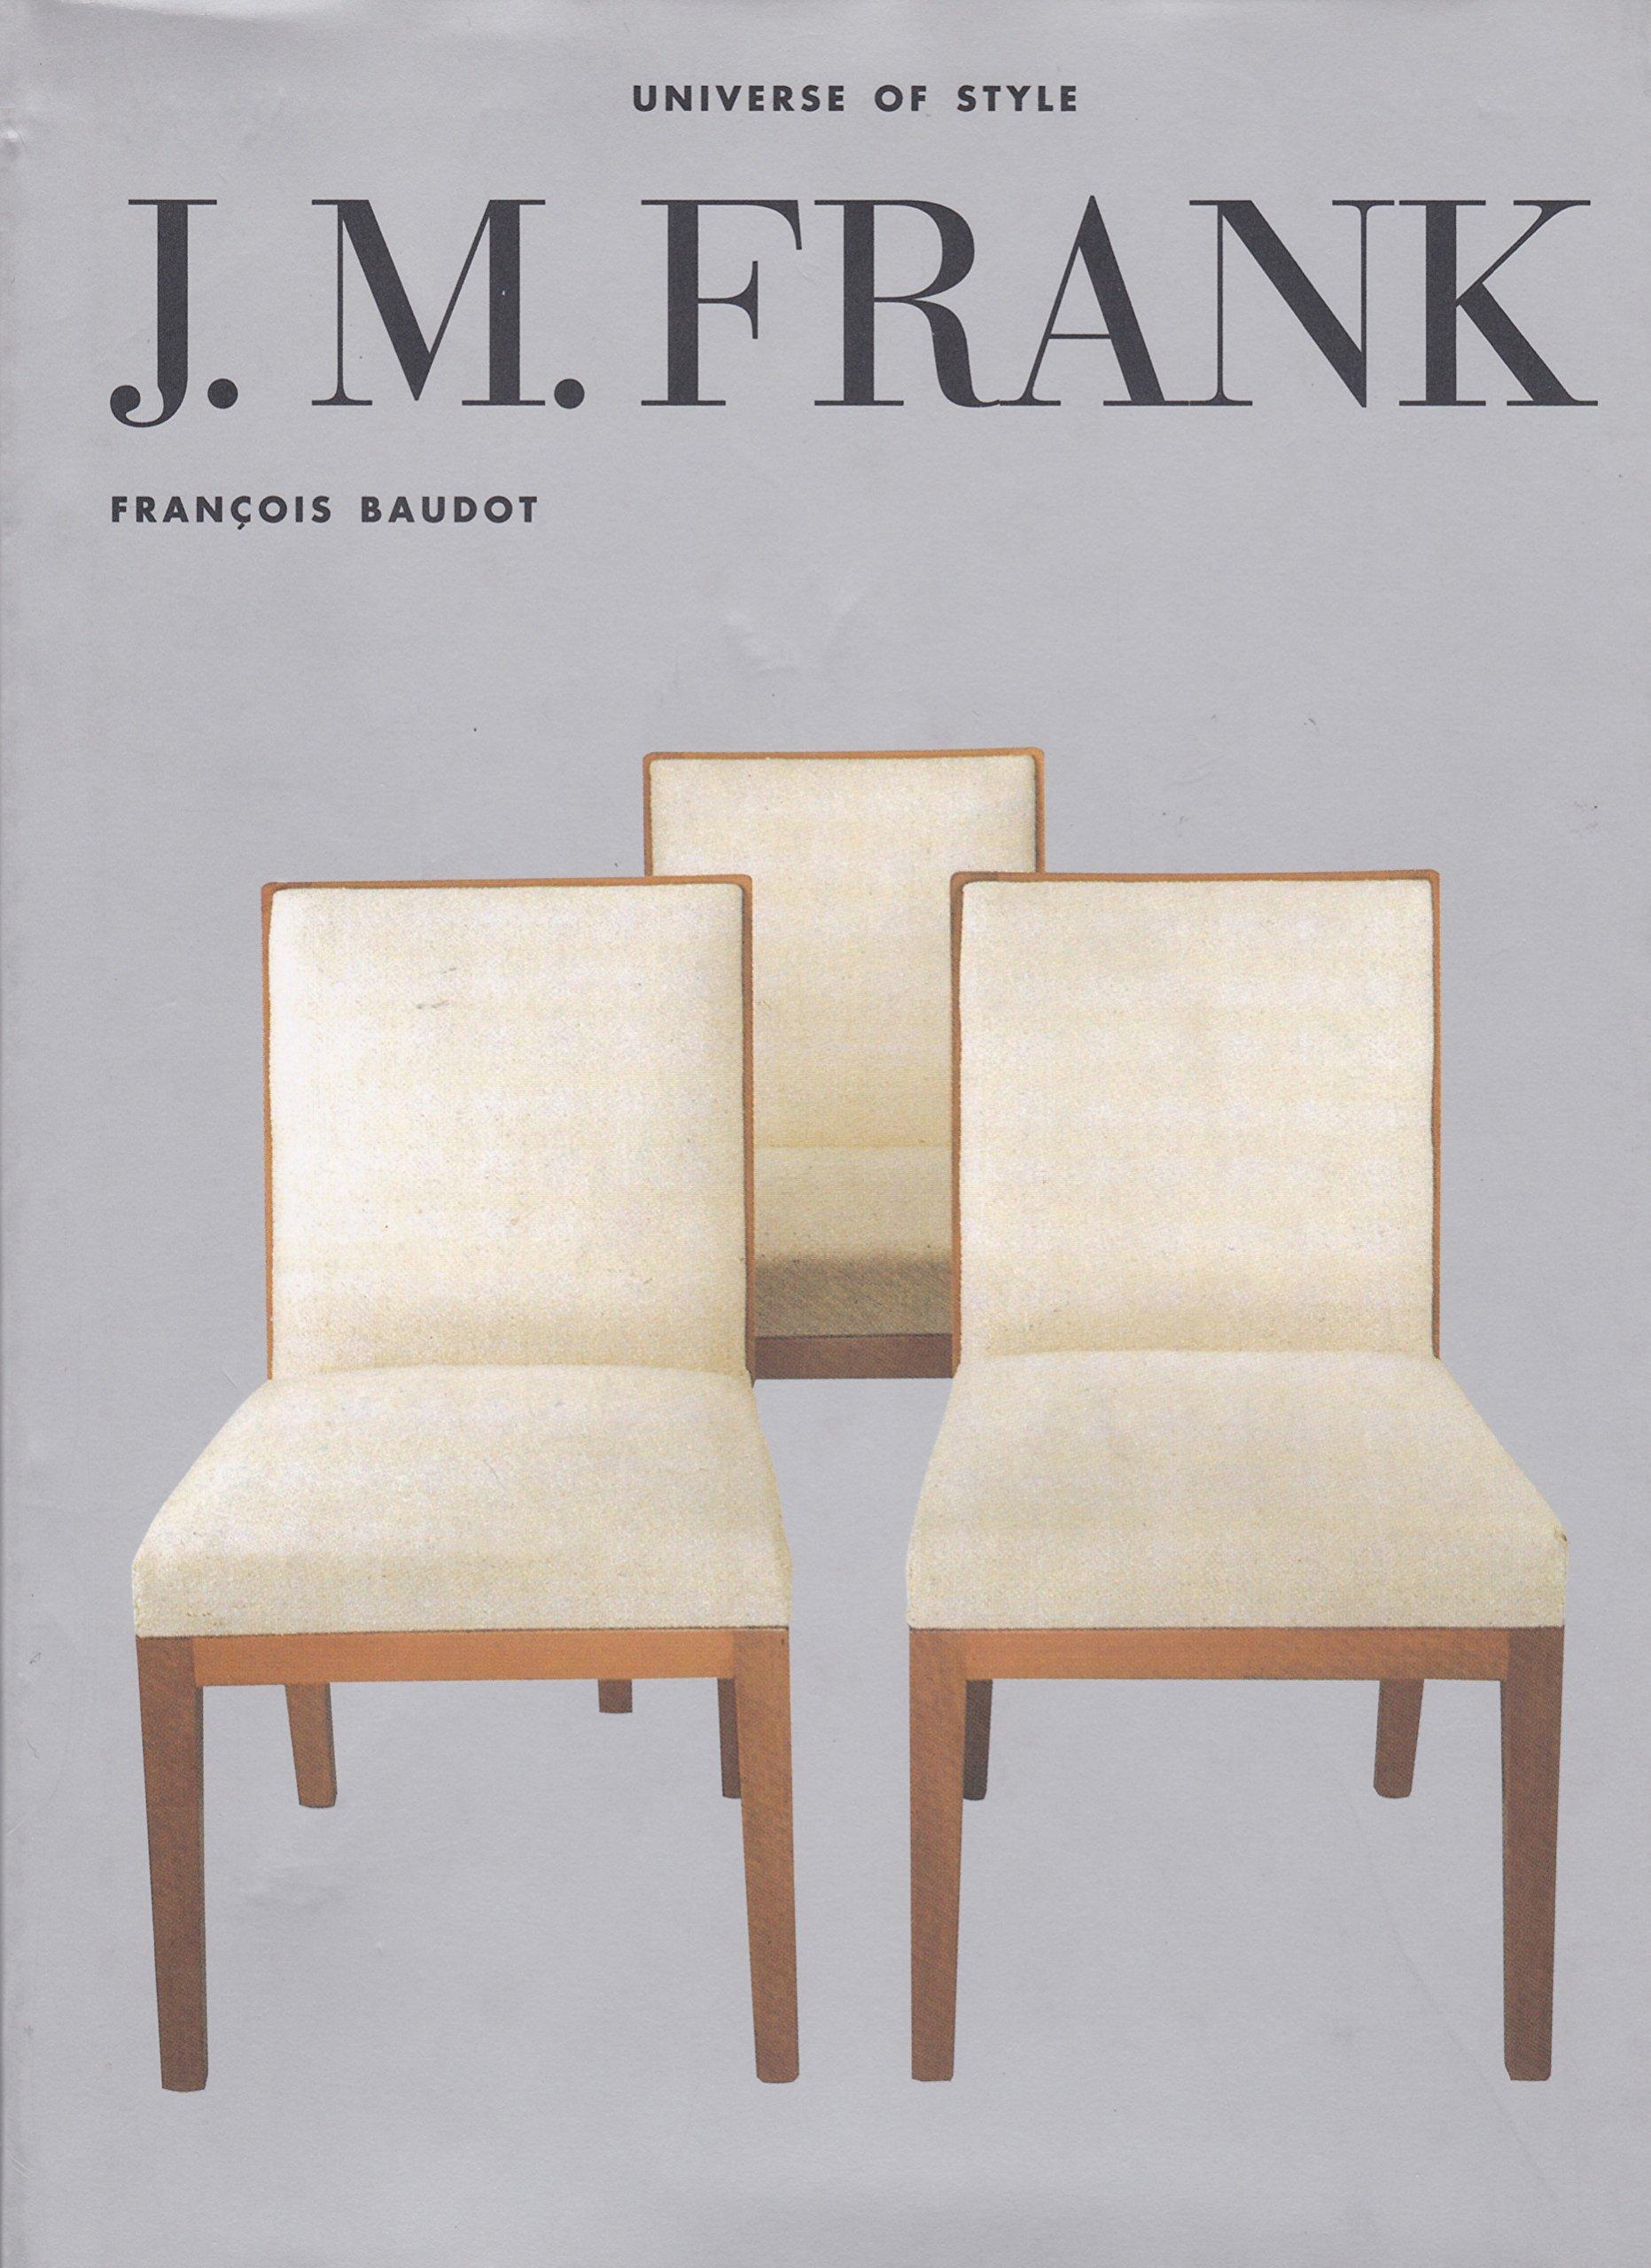 j m frank universe of style